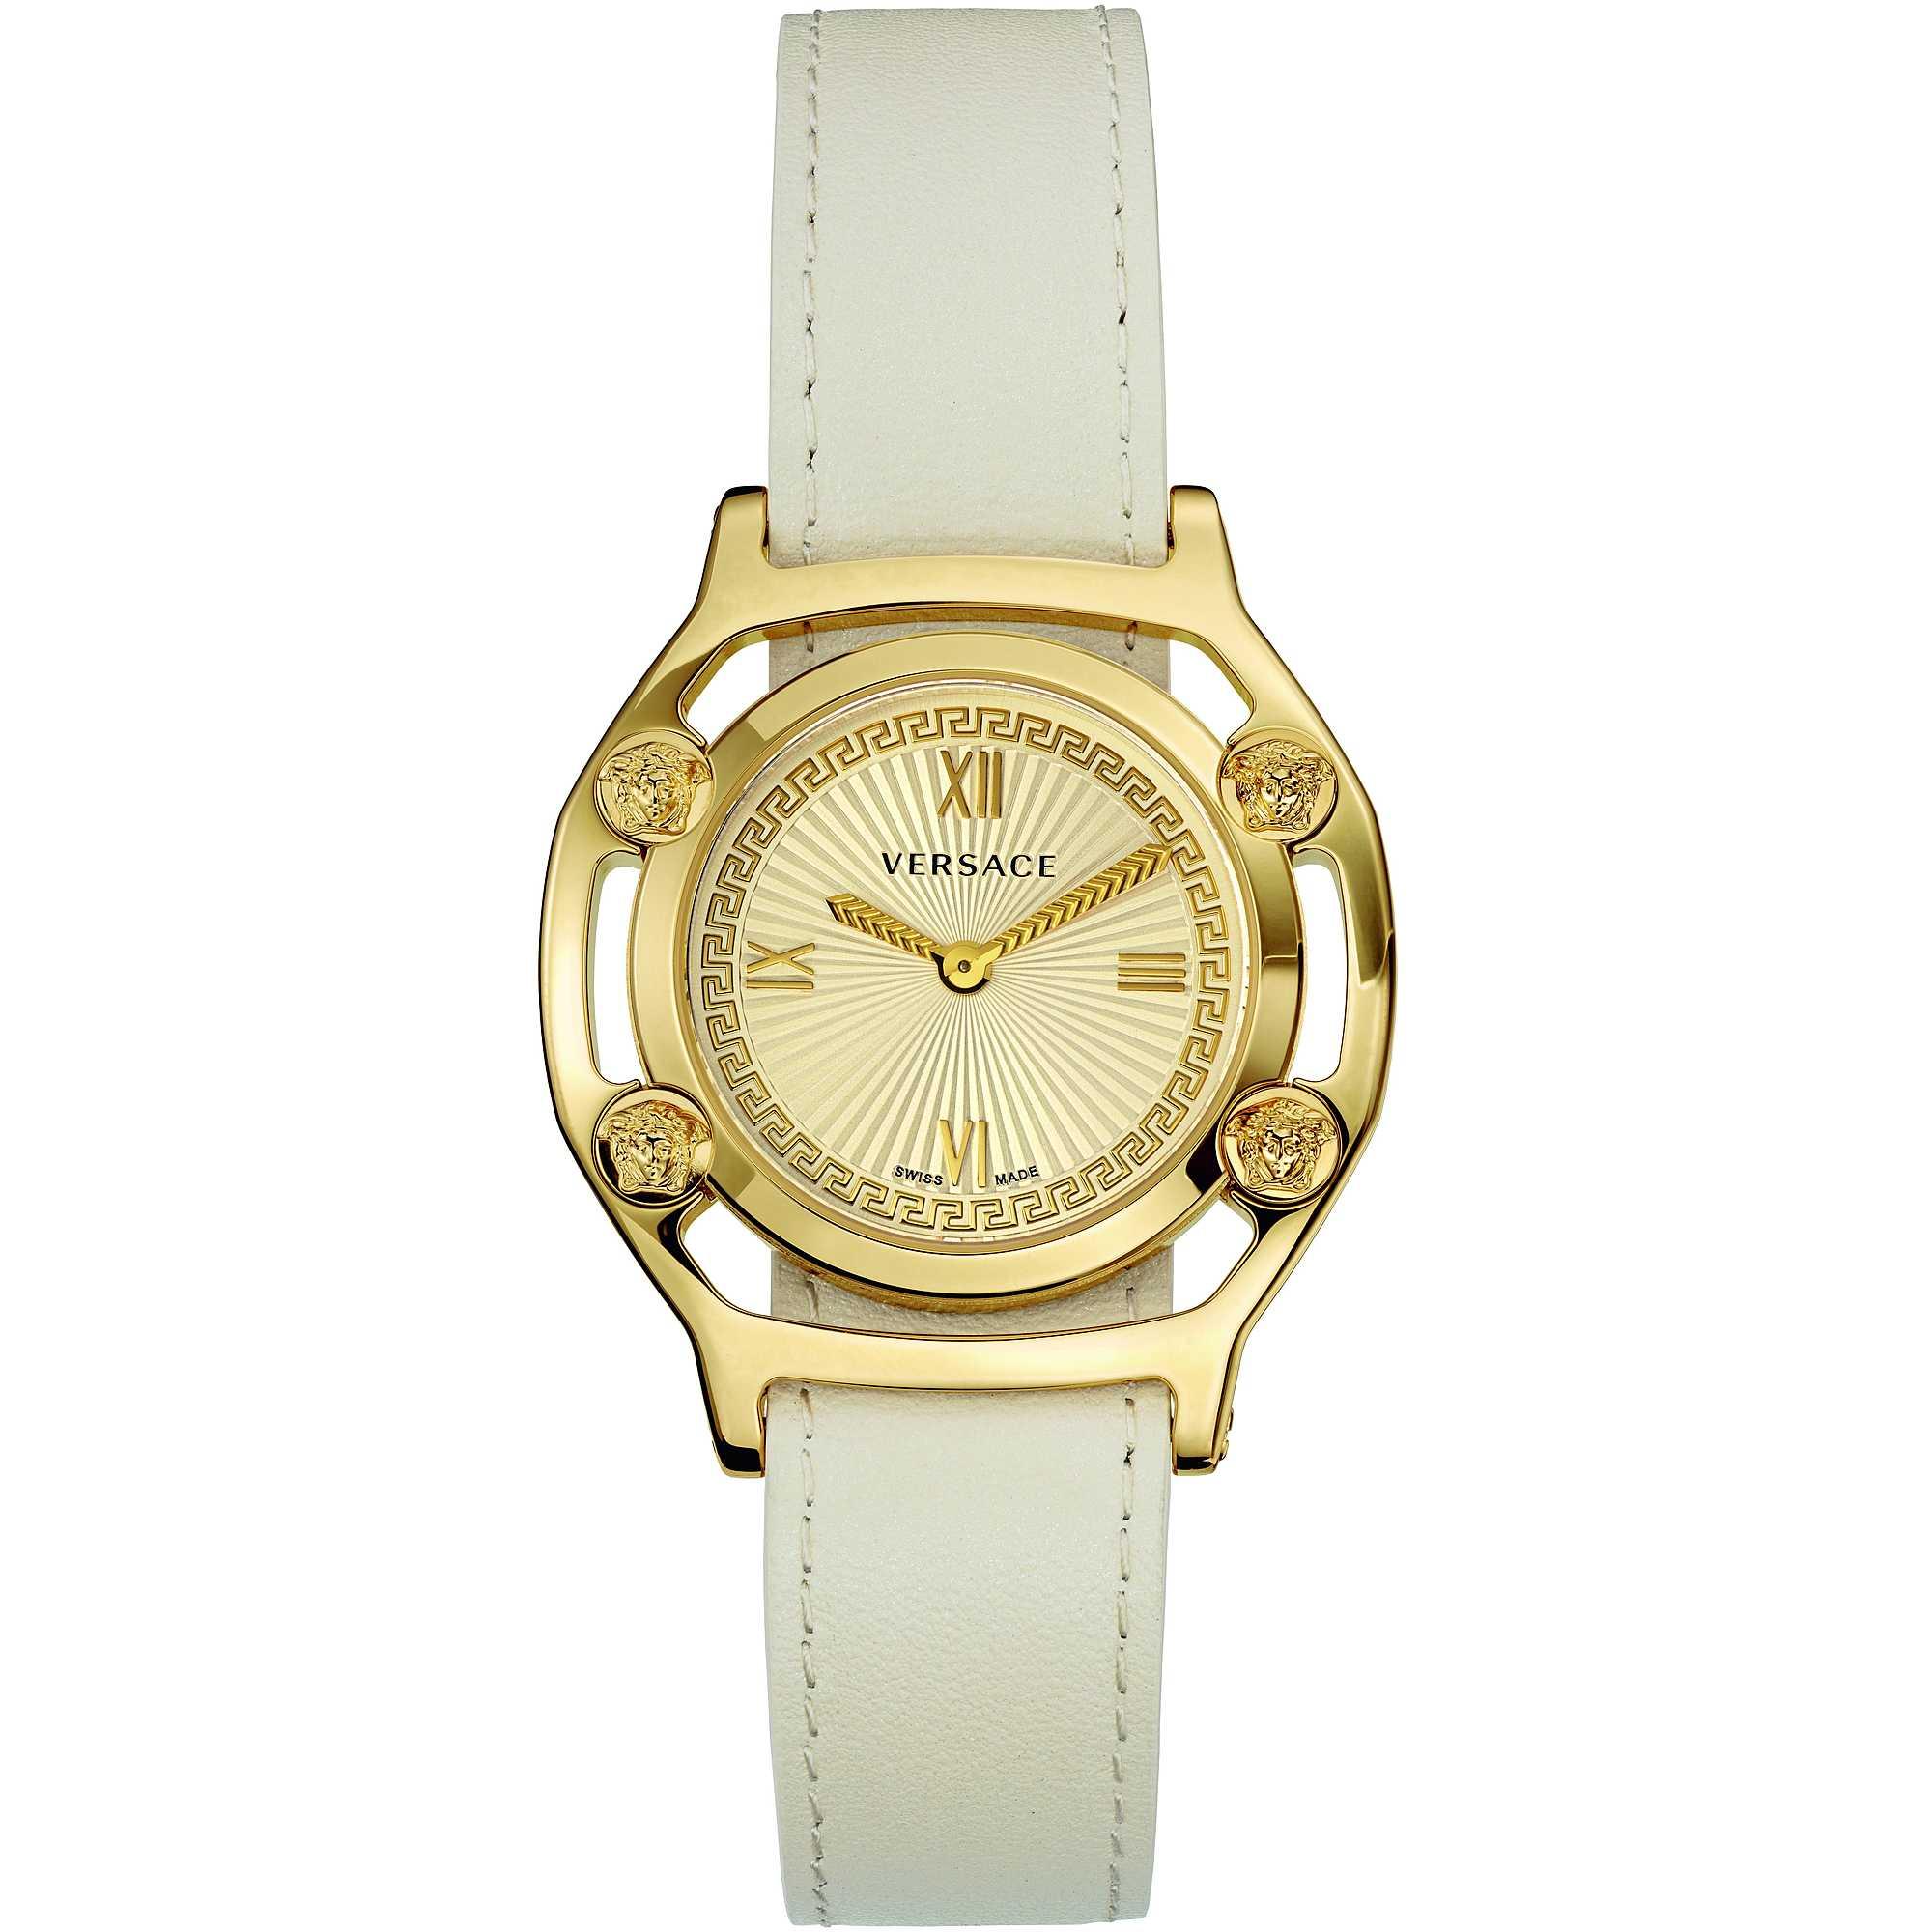 Versace Medusa Frame Watch-VEVF00620